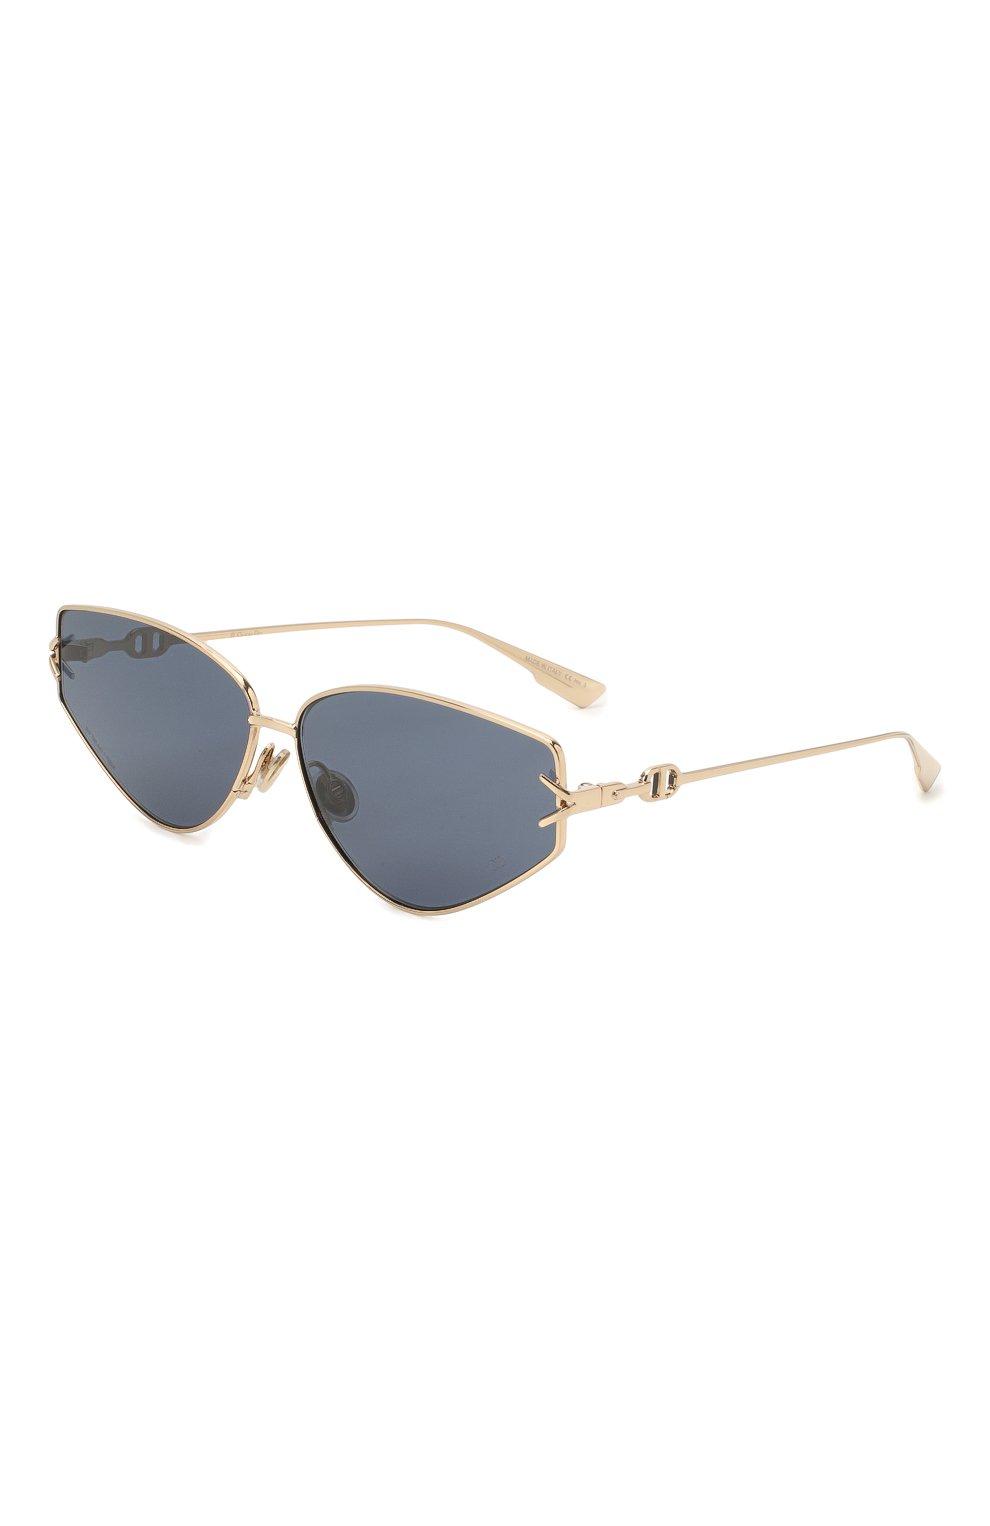 Женские солнцезащитные очки DIOR синего цвета, арт. DI0RGIPSY2 J5G | Фото 1